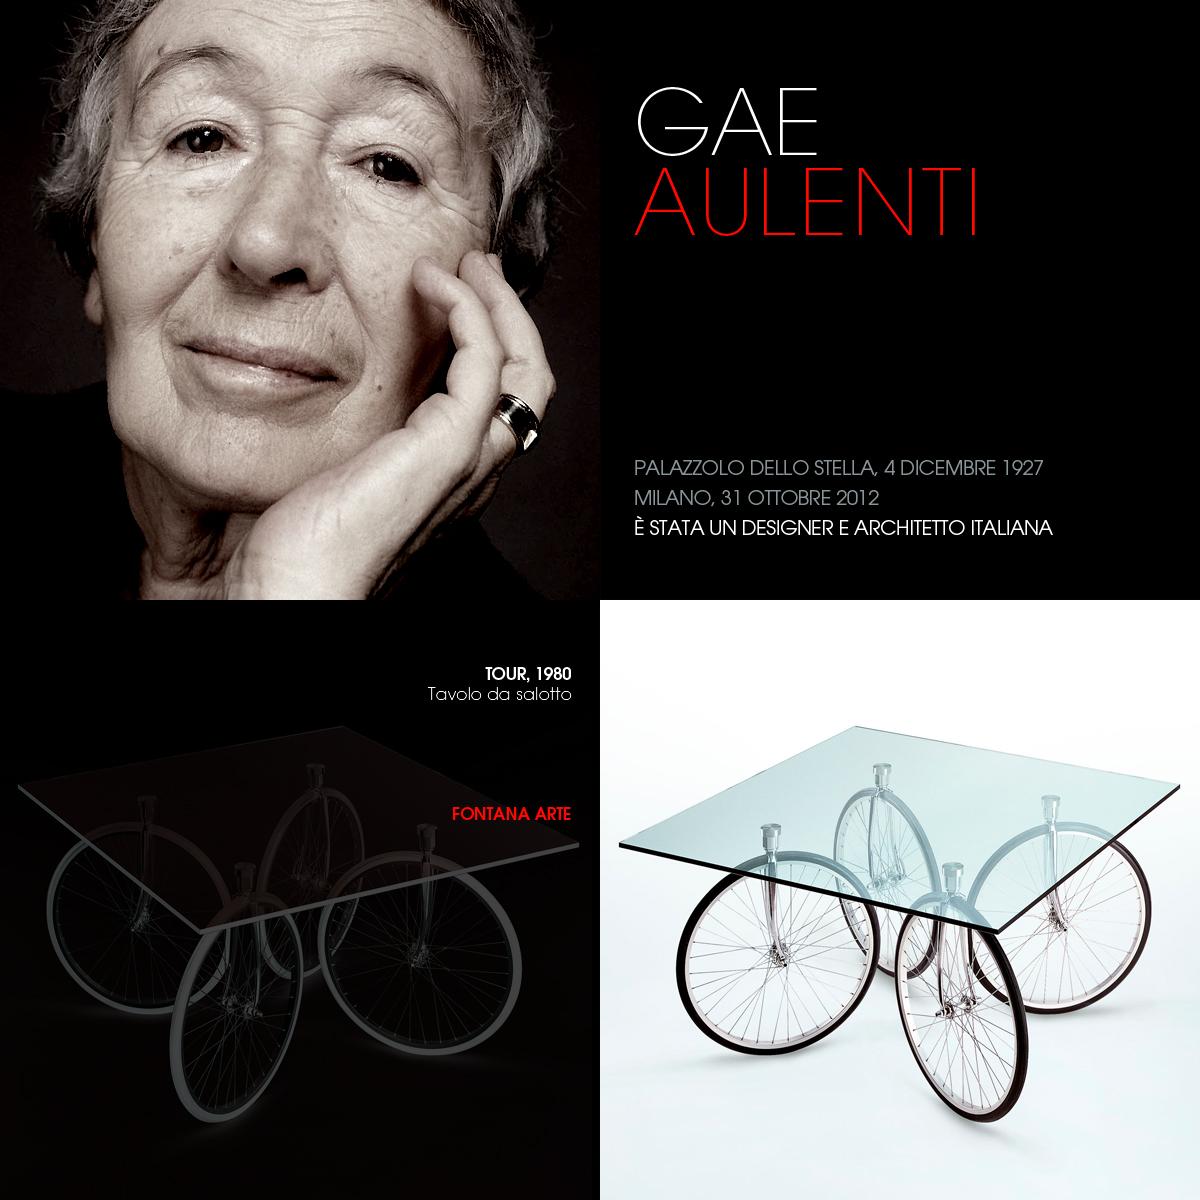 GaeAulenti